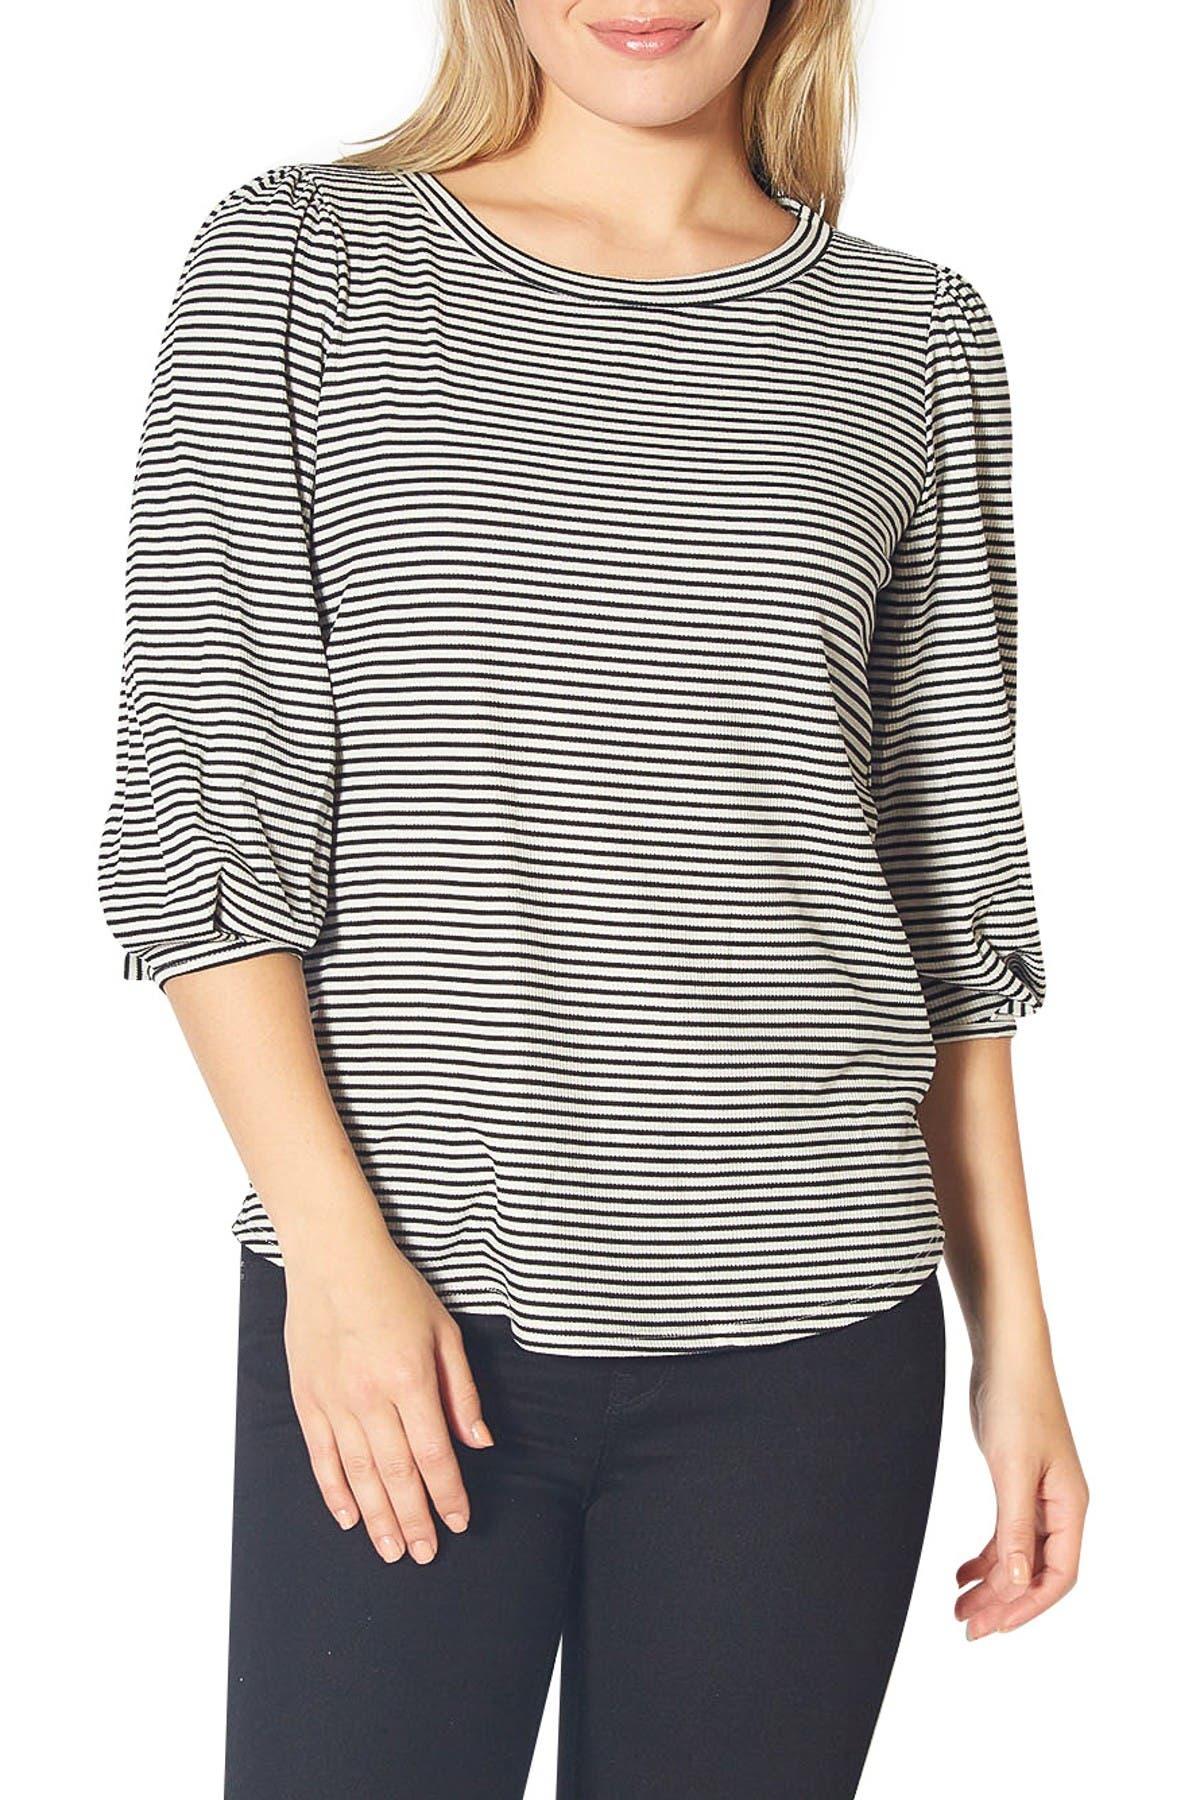 Image of Pleione 3/4 Length Sleeve Stripe Top